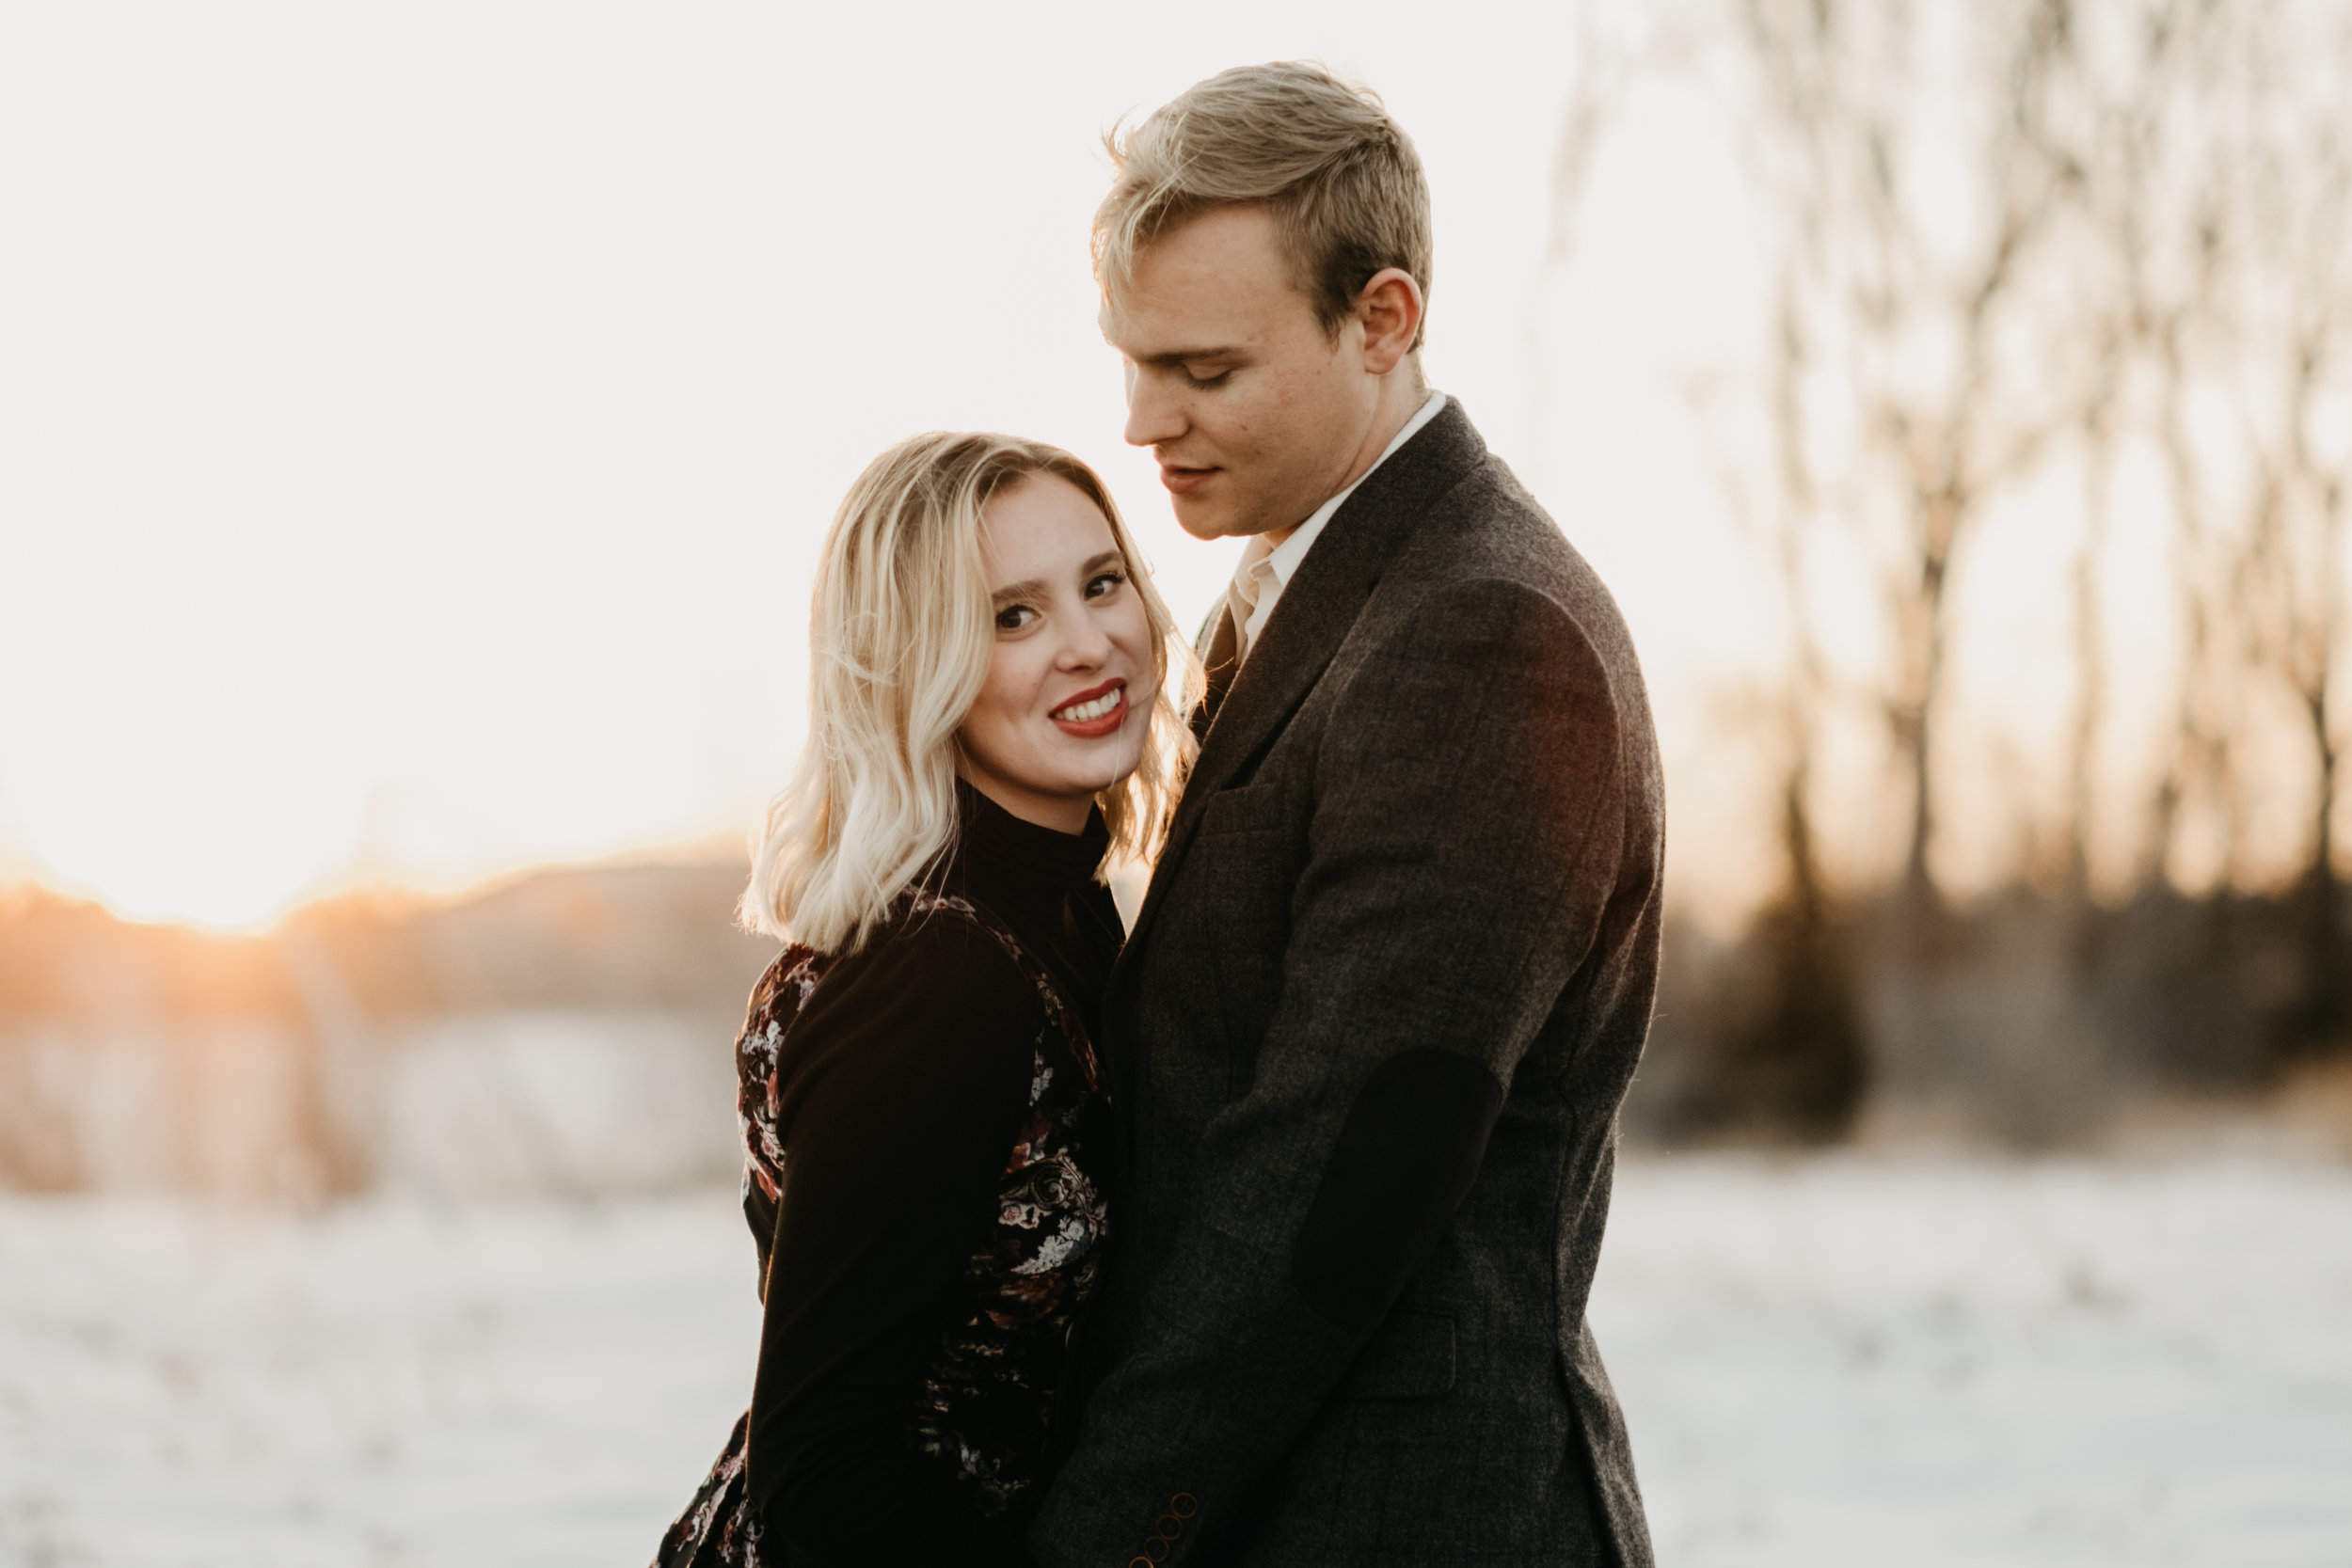 Talia + Brendan | Engagement Photography | Sioux Falls, South Dakota Photographer-142.jpg